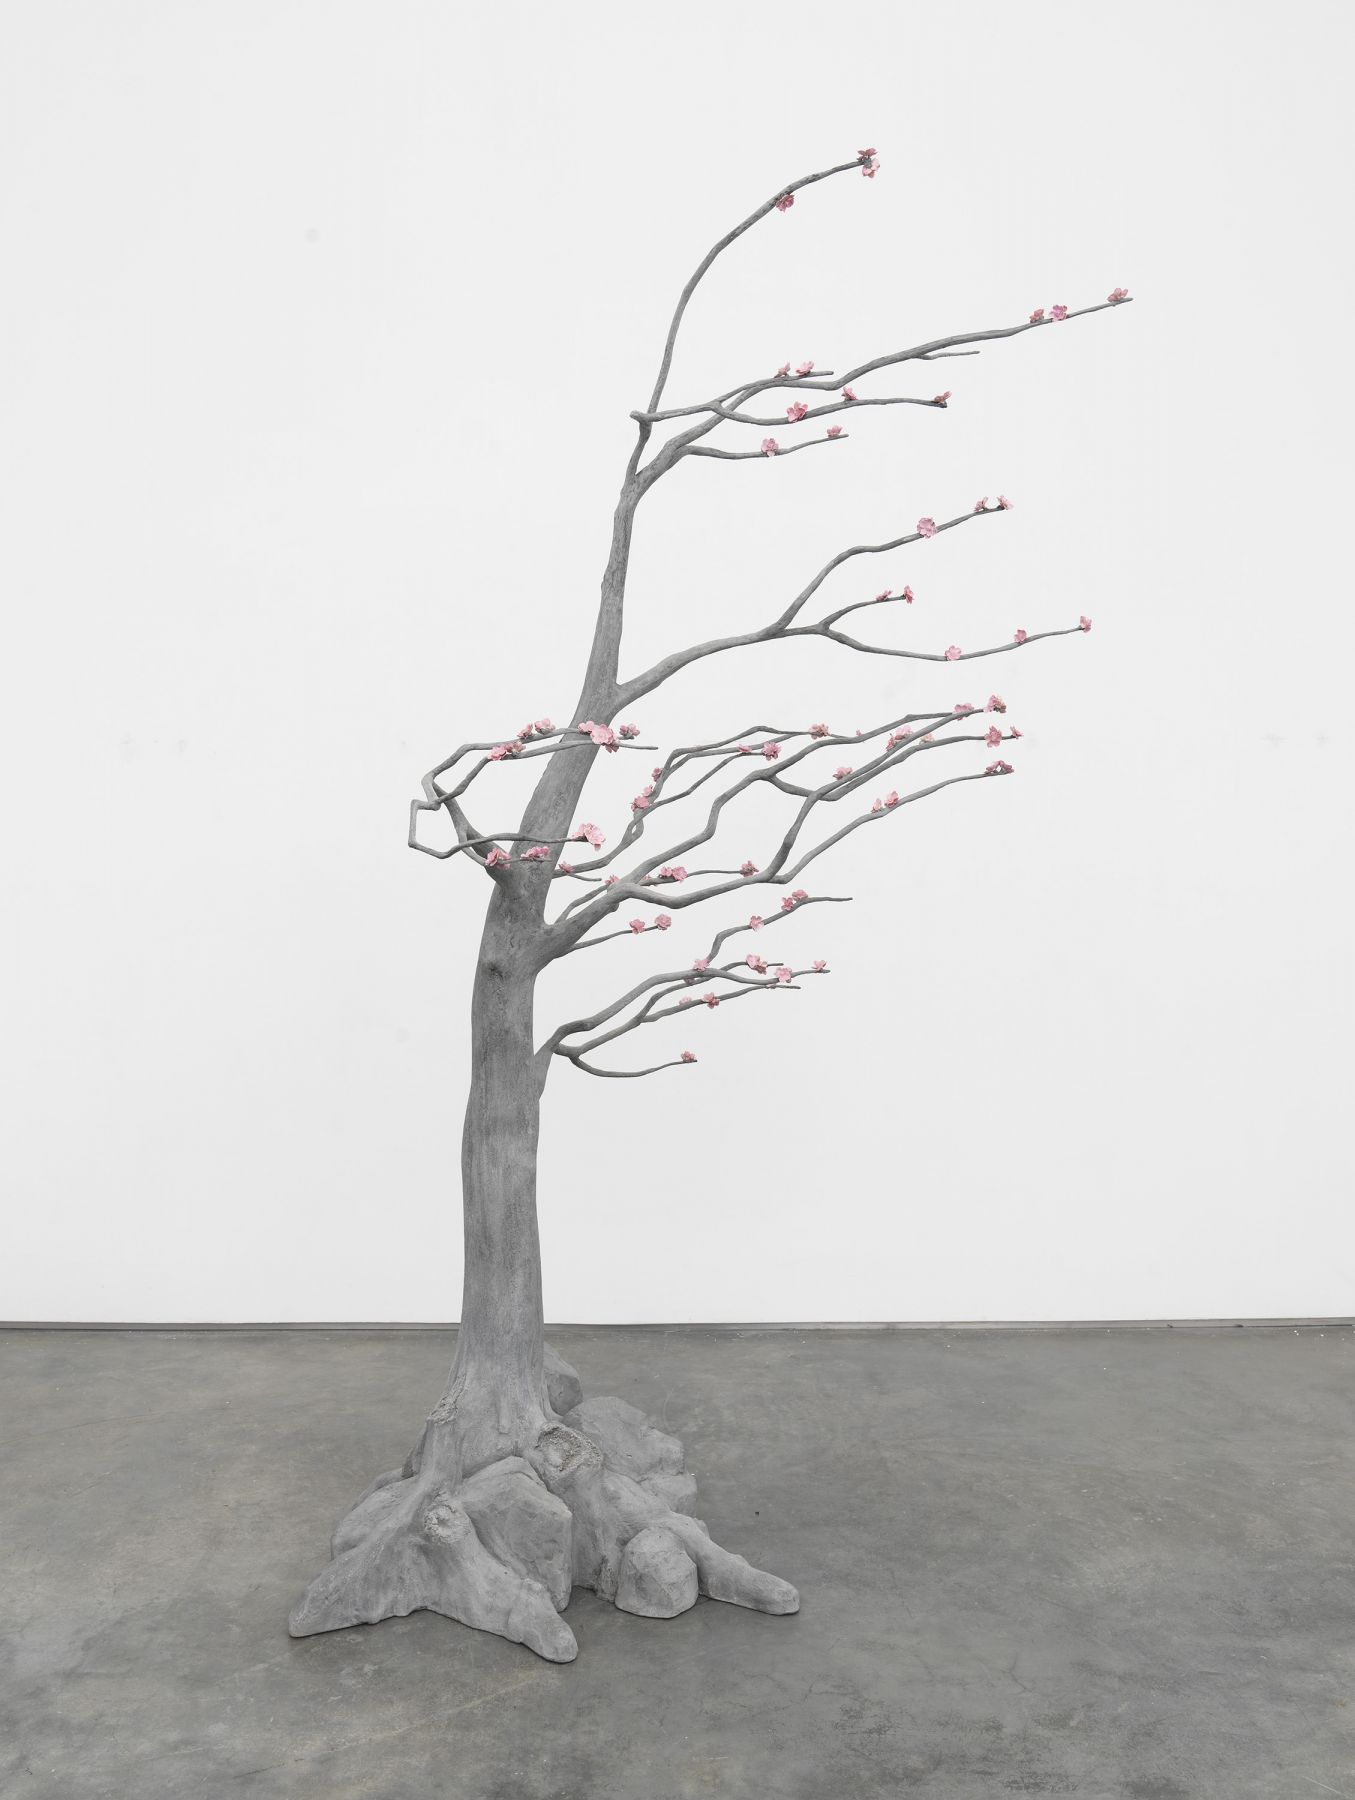 Blossom Tree (3), 2018, Steel, concrete, polyurethane, coated polyester, epoxy resin